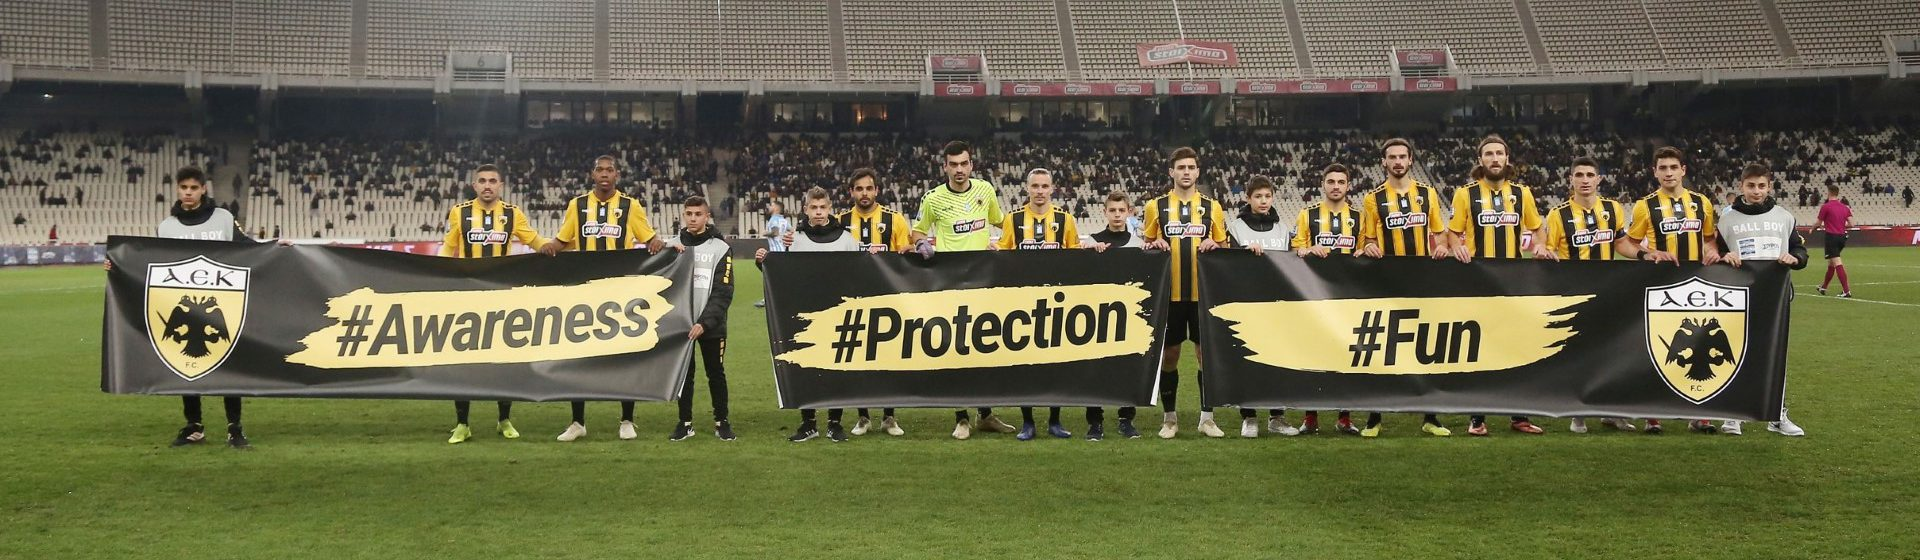 AEK FC ATHENS header